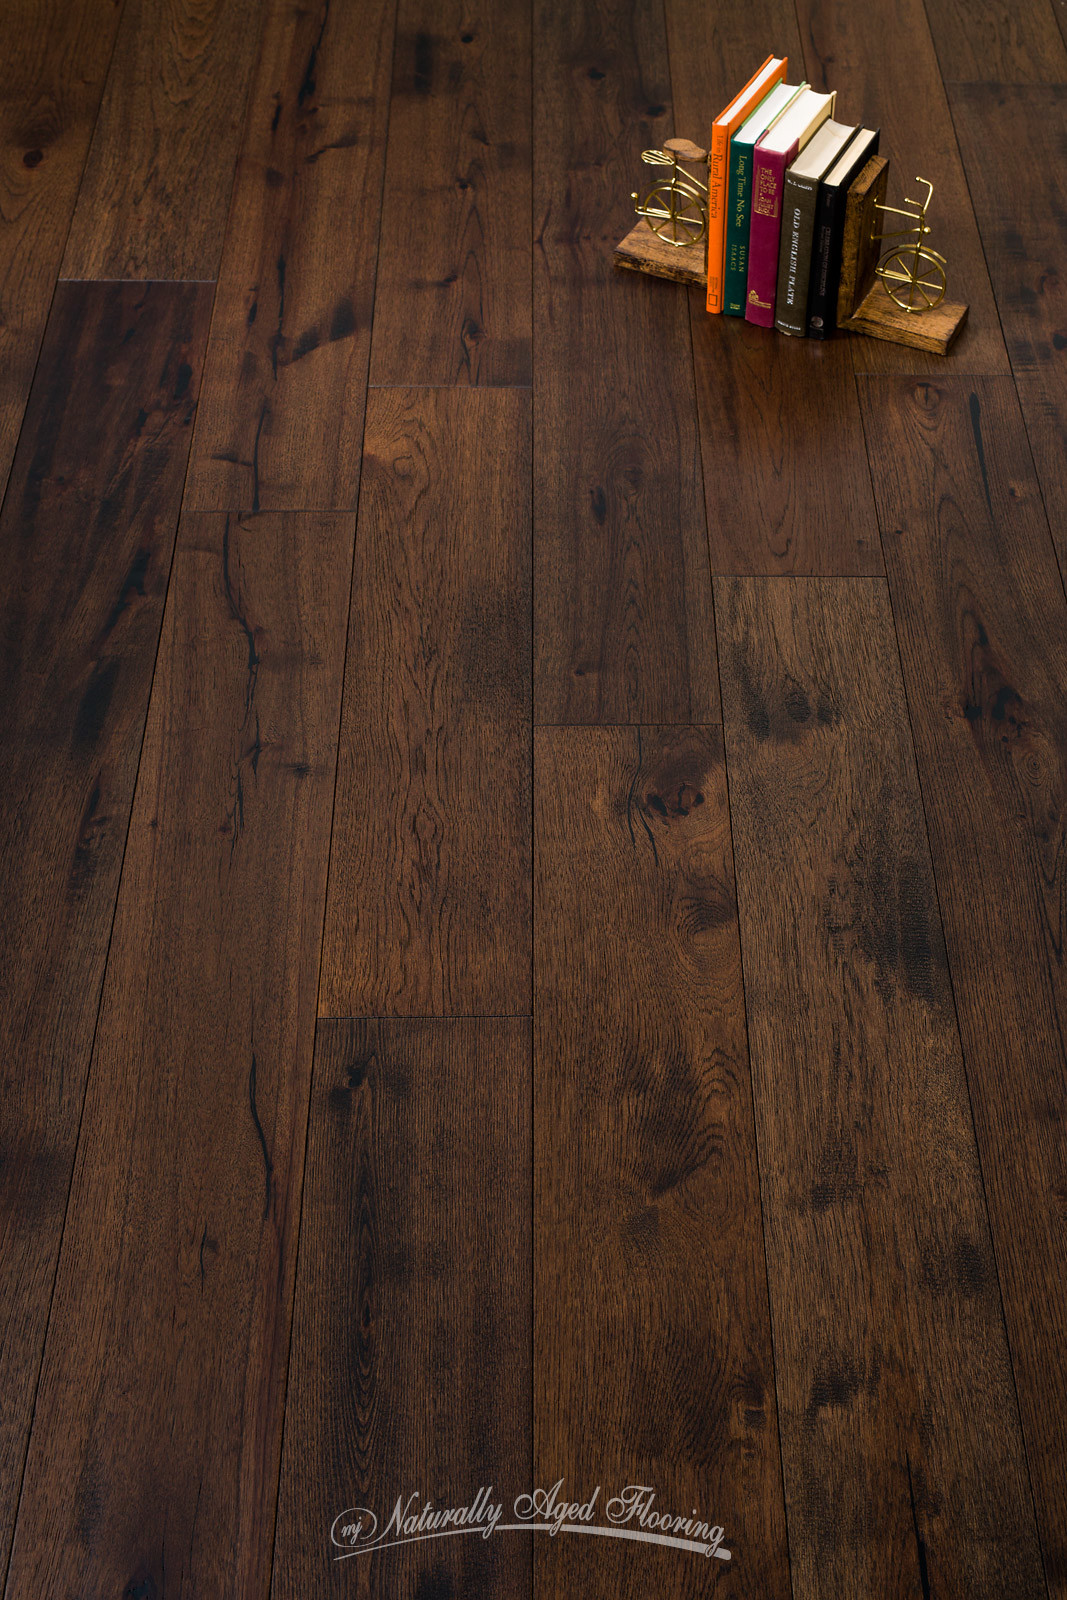 Desert Shadows Naturally Aged Flooring